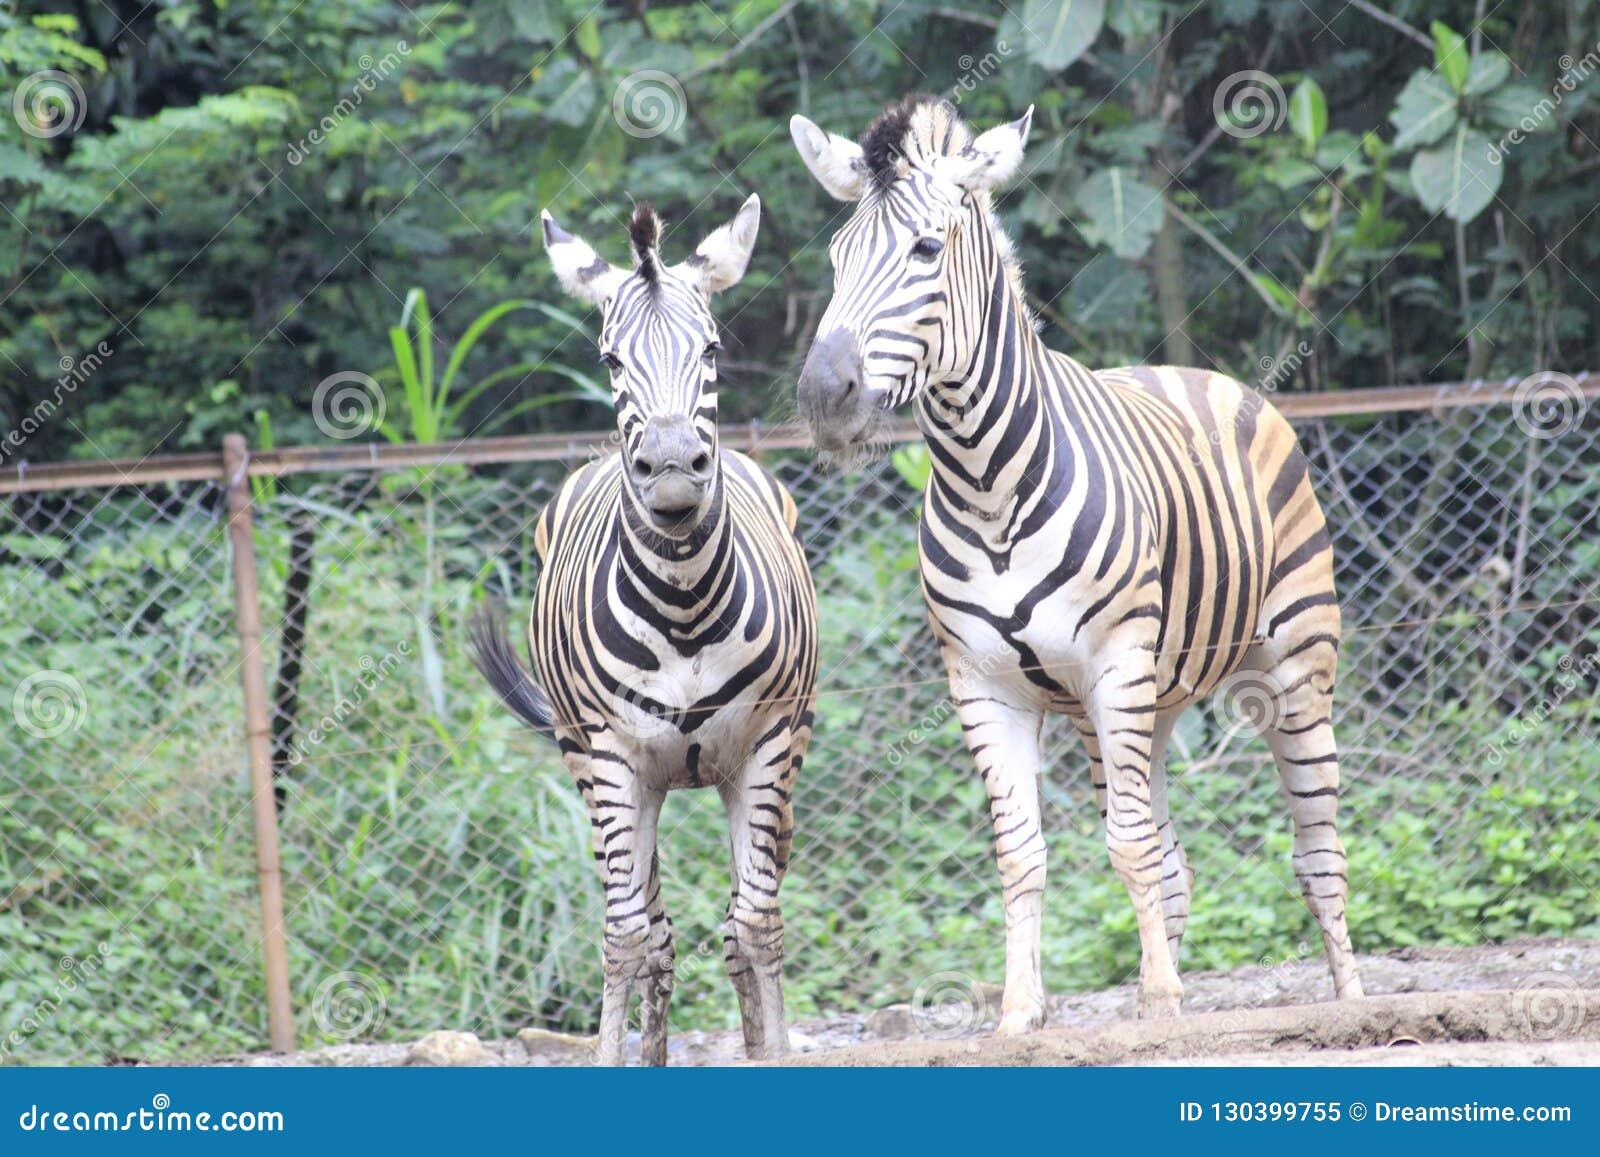 Zebra am Zoo Bandung Indonesien 2